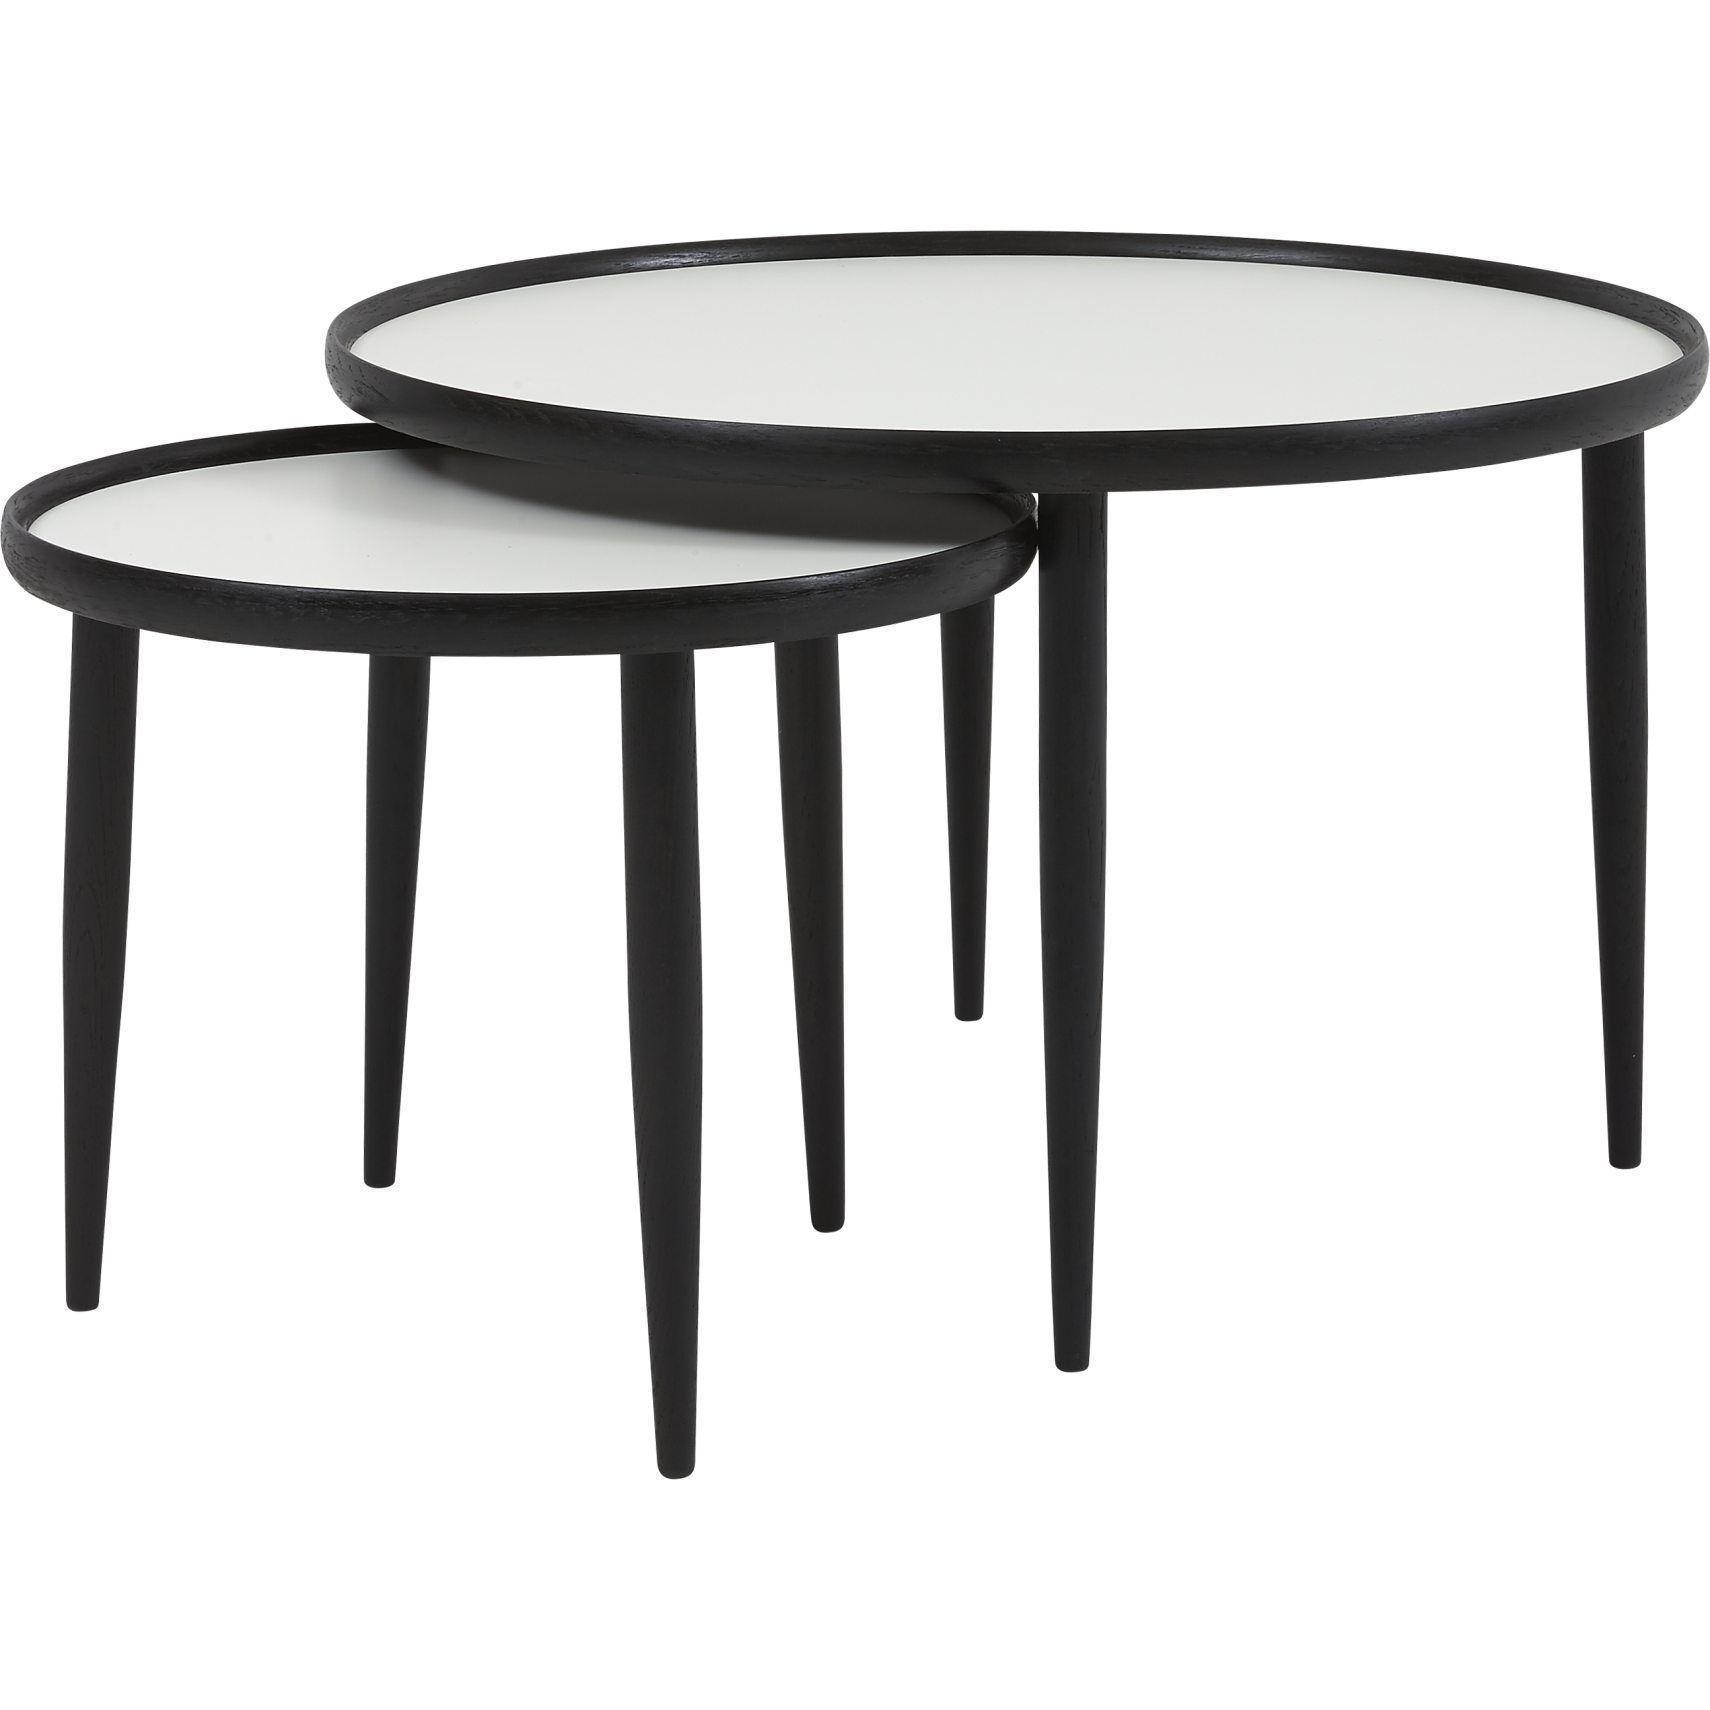 3eee68c24ba33452c4046ca72d2672fd Impressionnant De Table Gigogne Ikea Concept